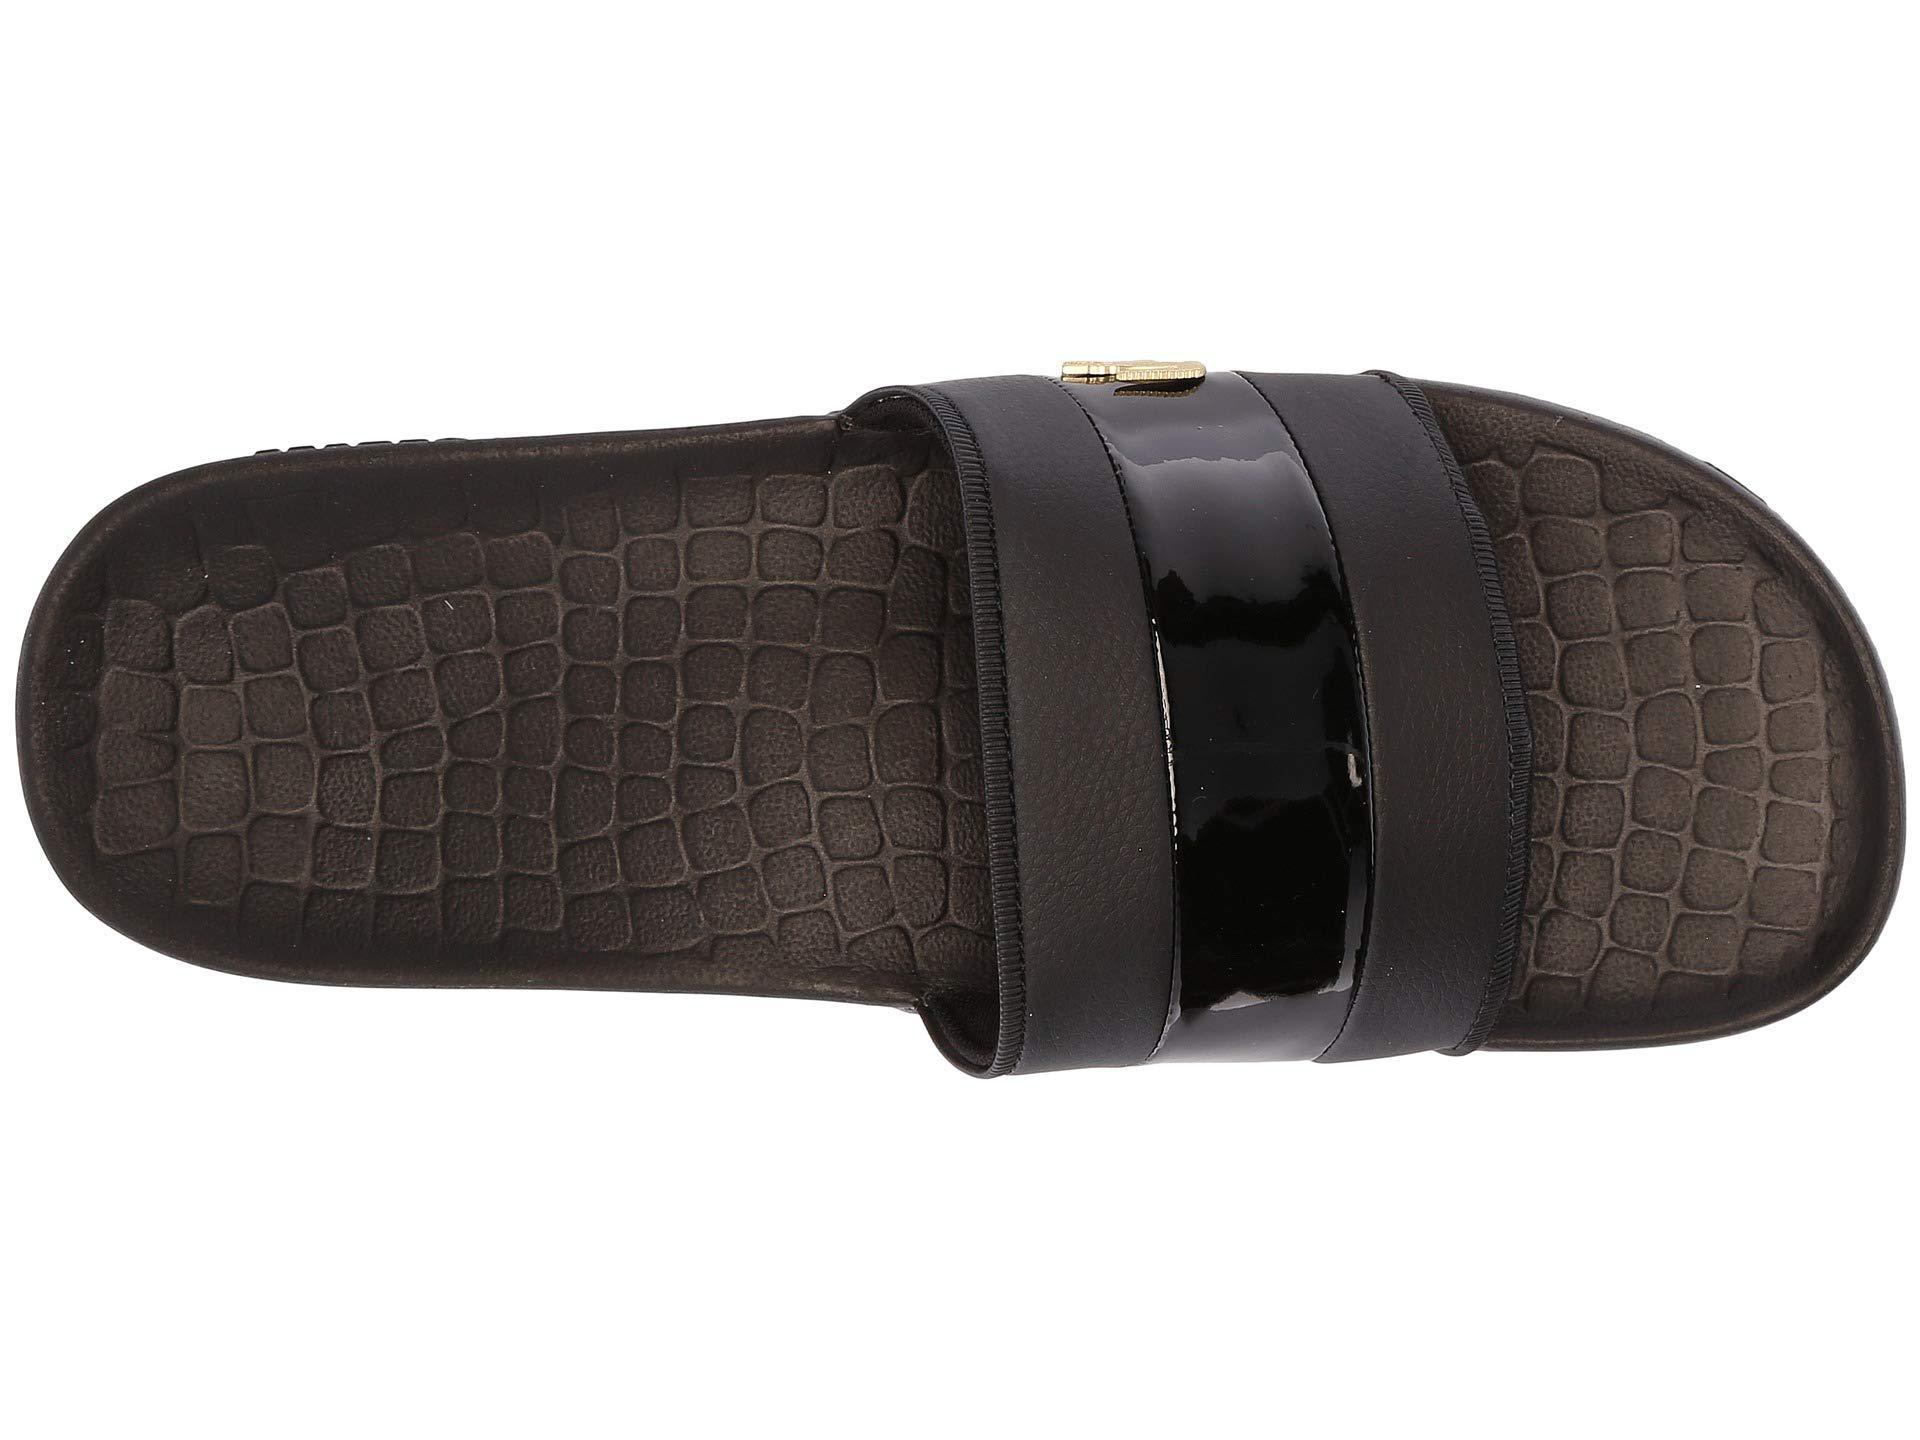 1fe314de4be7a Lacoste - Black Fraisier 118 1 U (green gold) Men s Shoes for Men. View  fullscreen